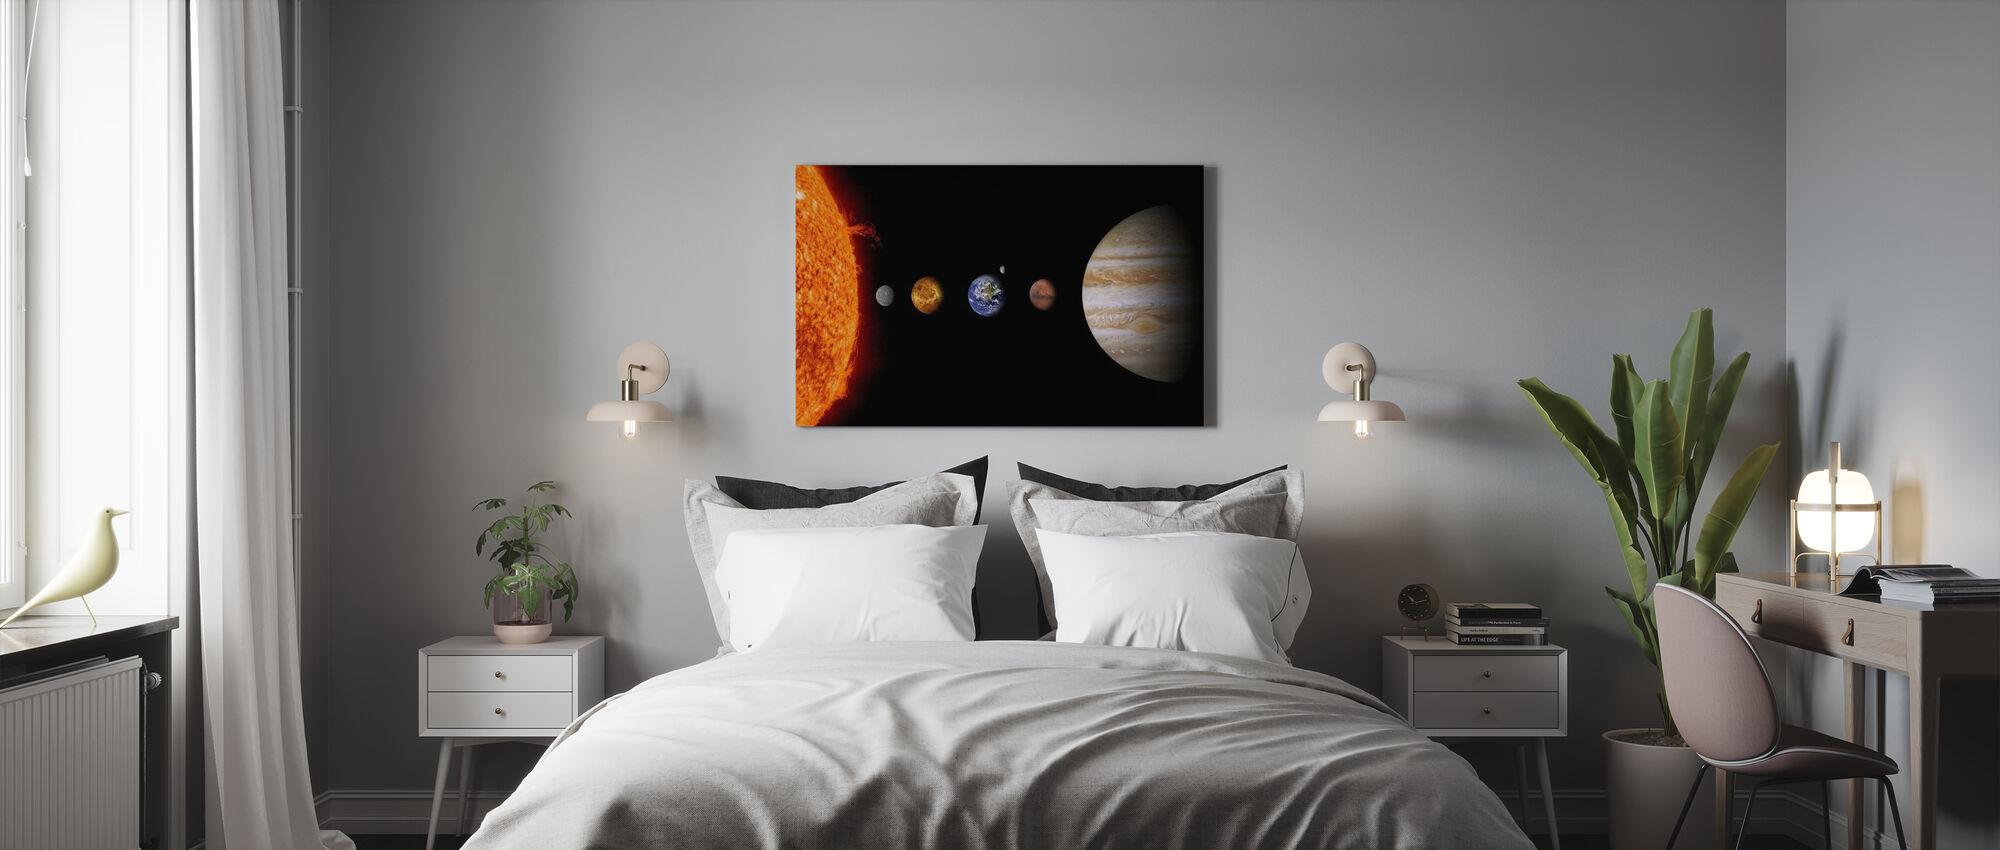 Solsystemet - Lerretsbilde - Soverom